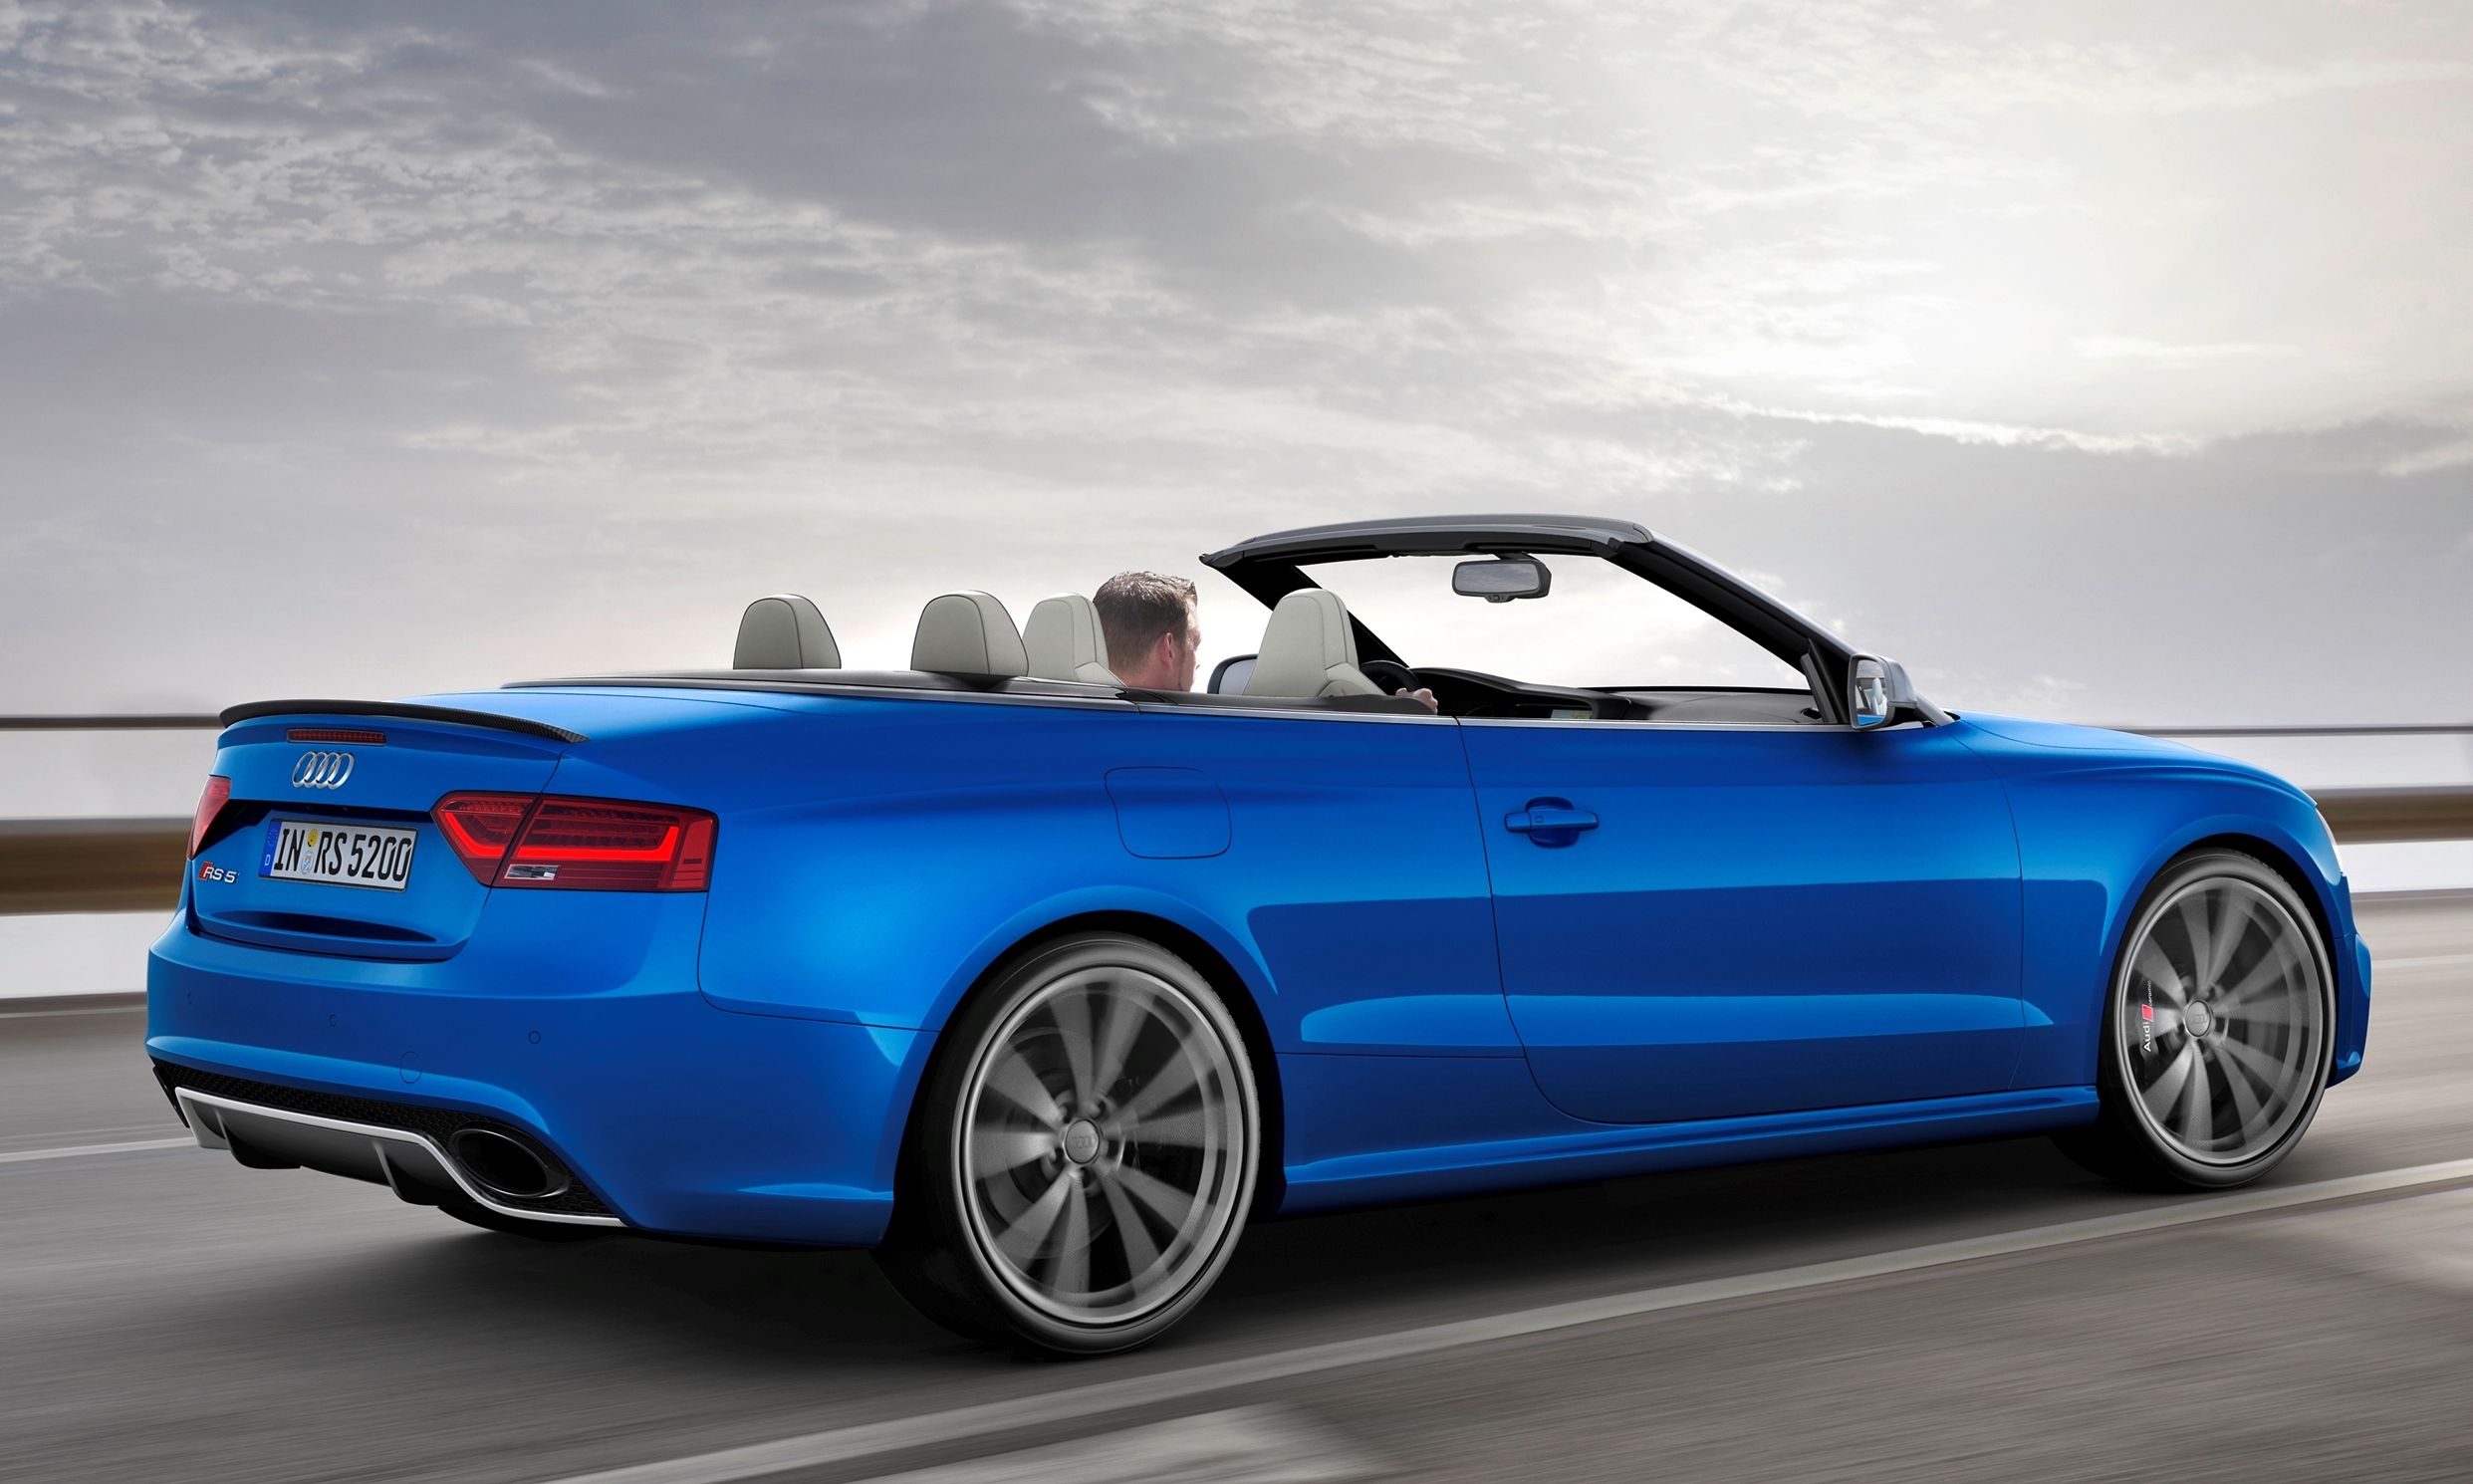 2014 Audi Rs5 Cabriolet Buyers Guide Black Optics Vs